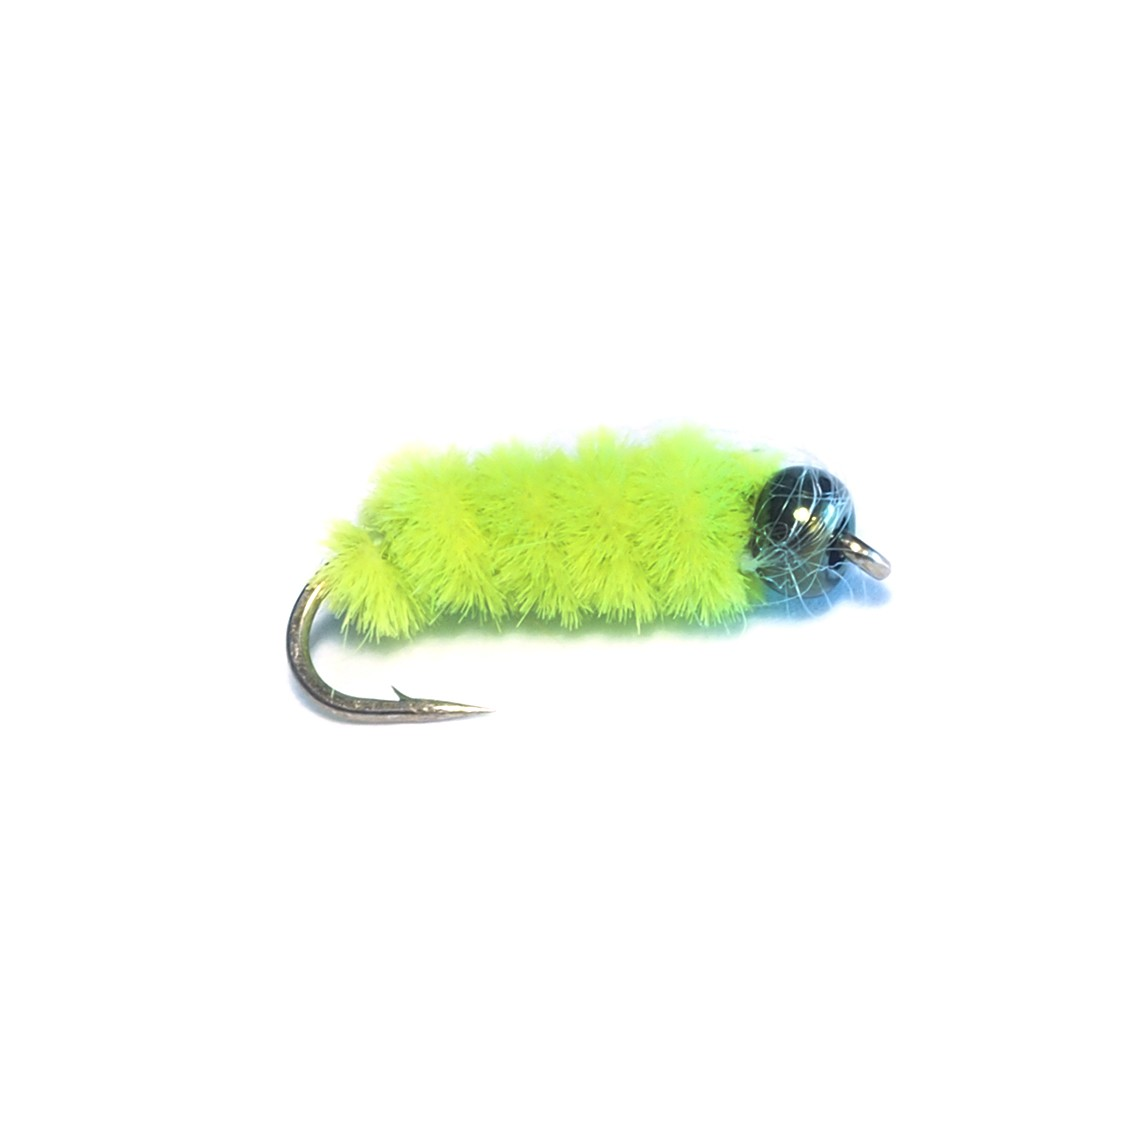 Glass Bead Larva